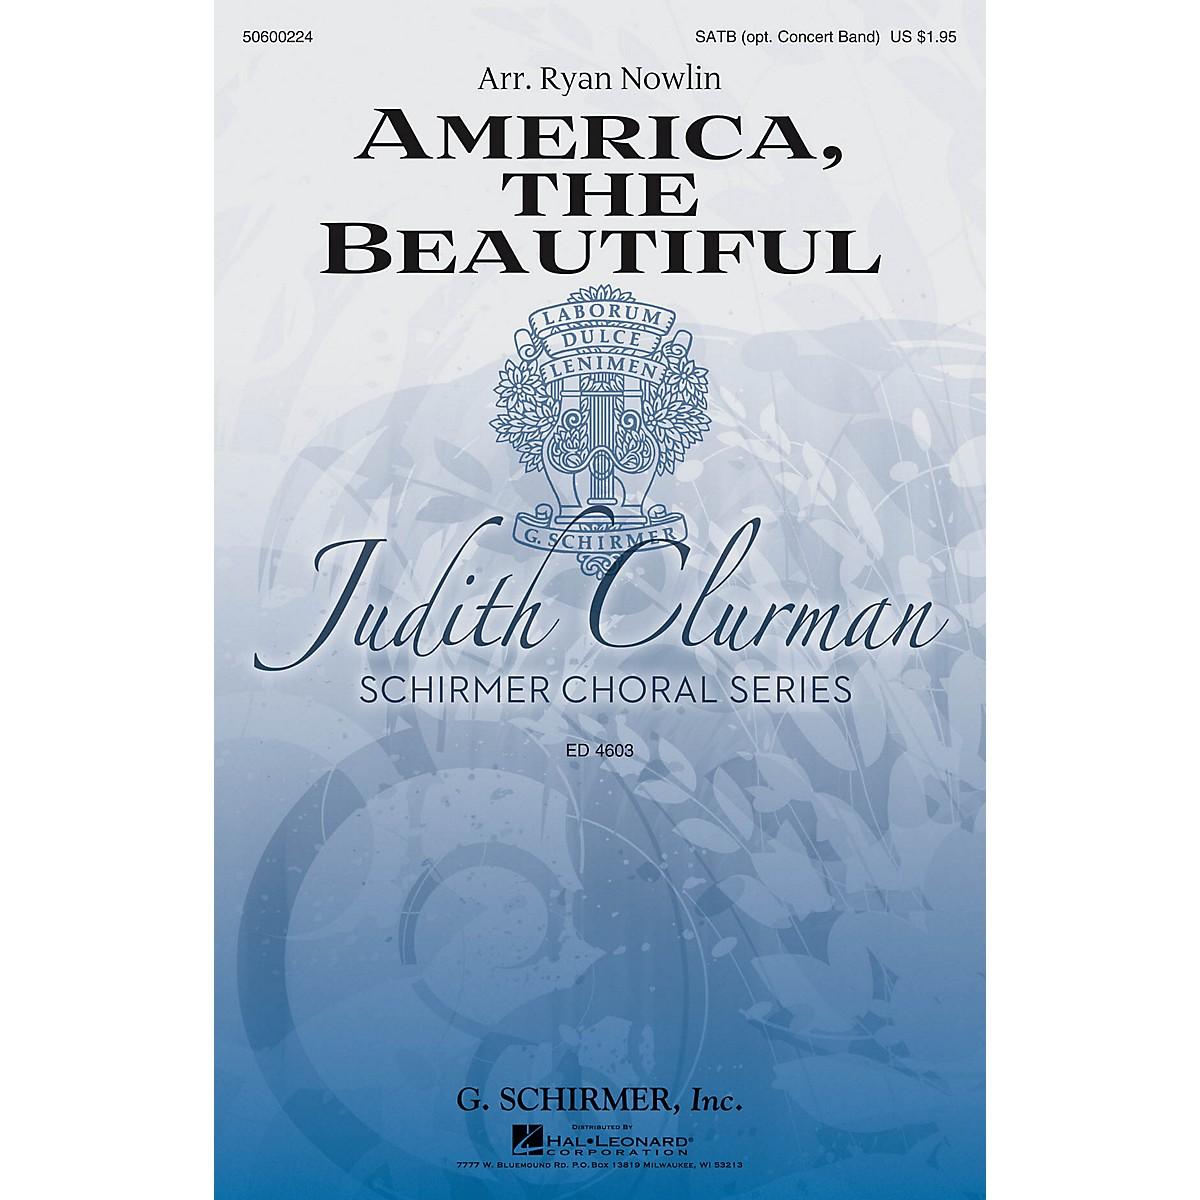 G. Schirmer America, the Beautiful (Judith Clurman Choral Series) SATB arranged by Ryan Nowlin